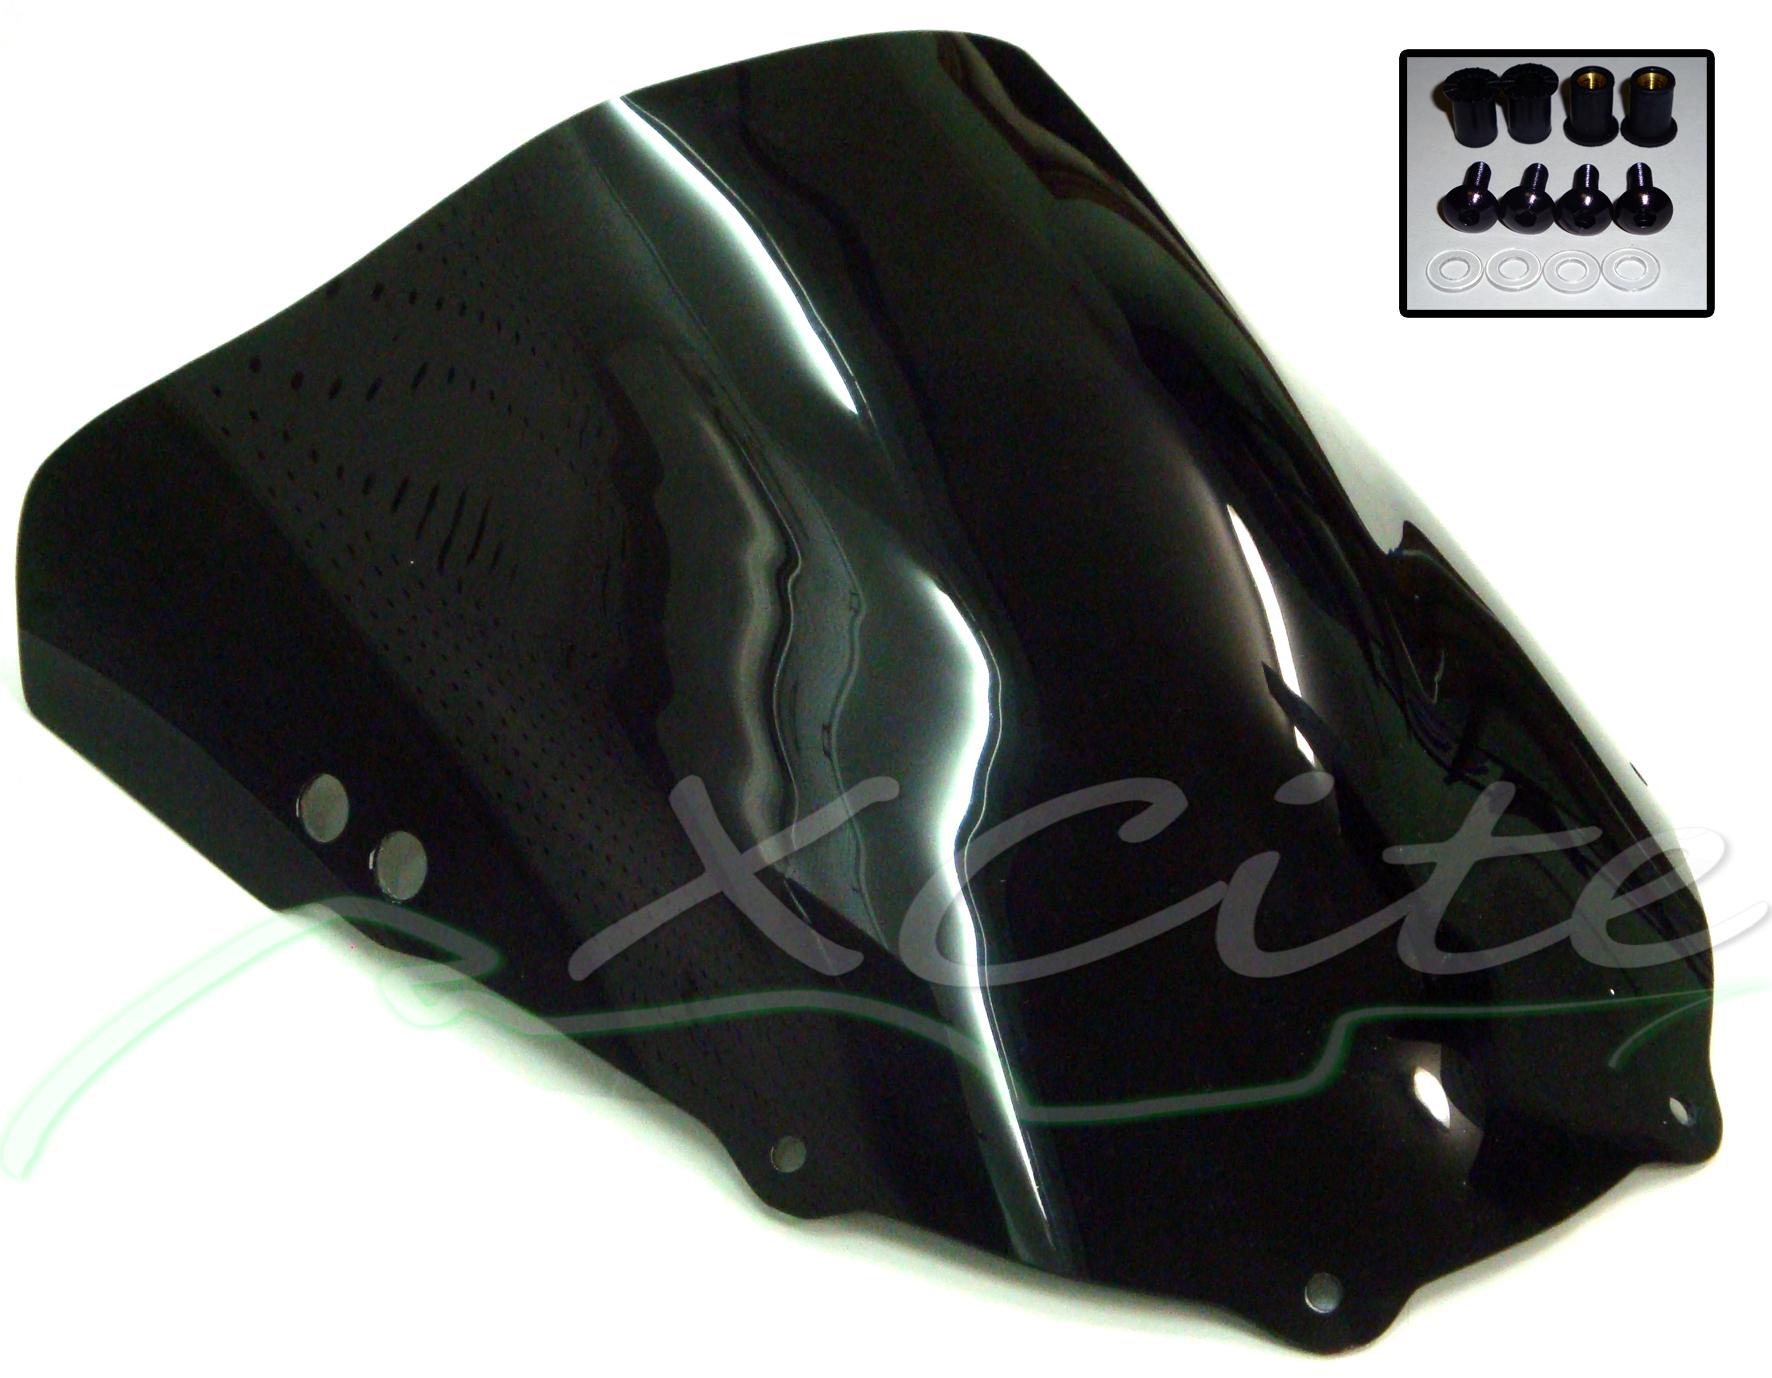 Double Bubble Windscreen Black Cbr250rr Cbr250 250rr Mc22 Free Tankpad Honda Cbr 250 Rr Original Categories